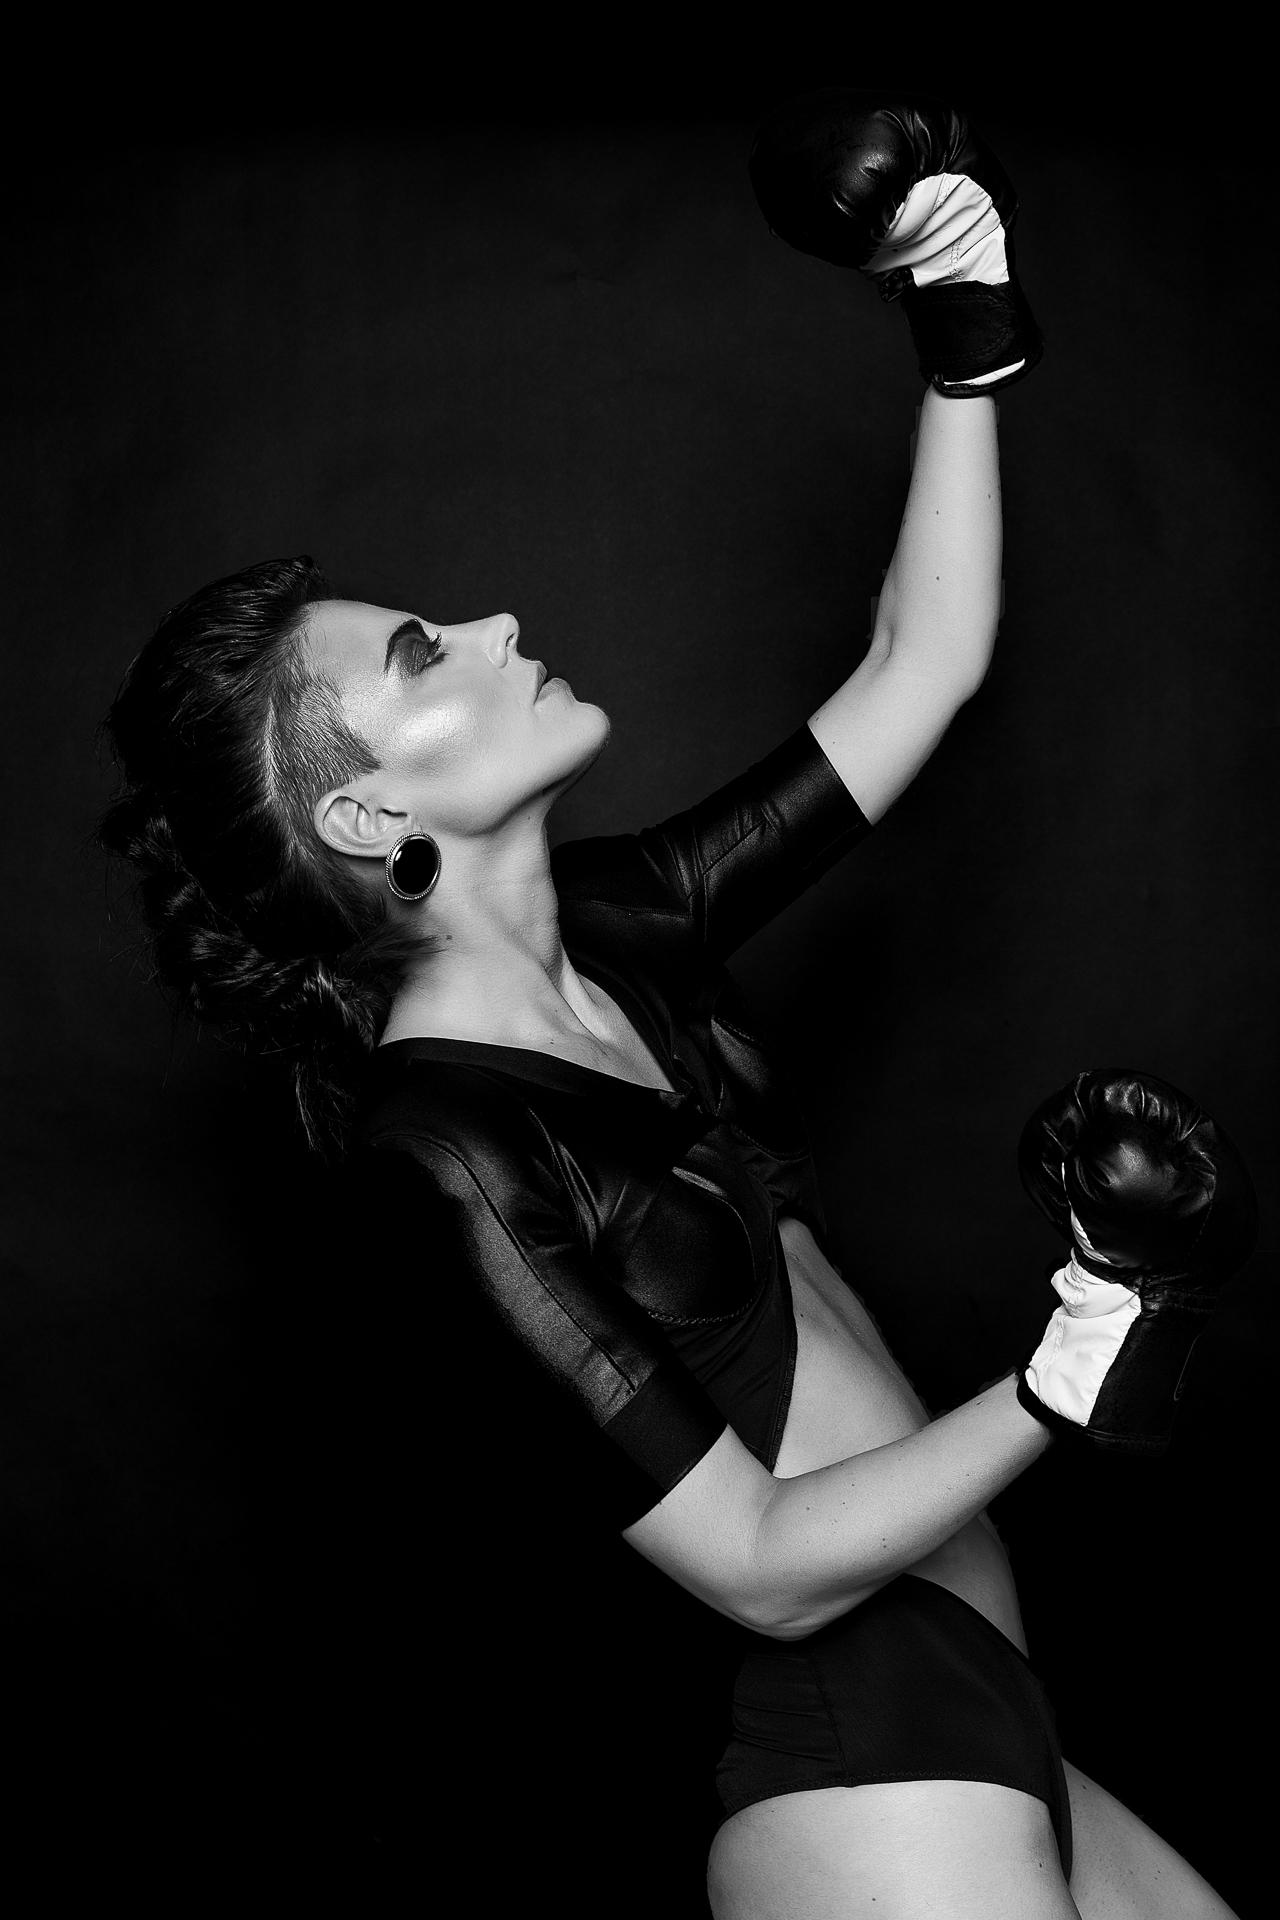 Model boxing